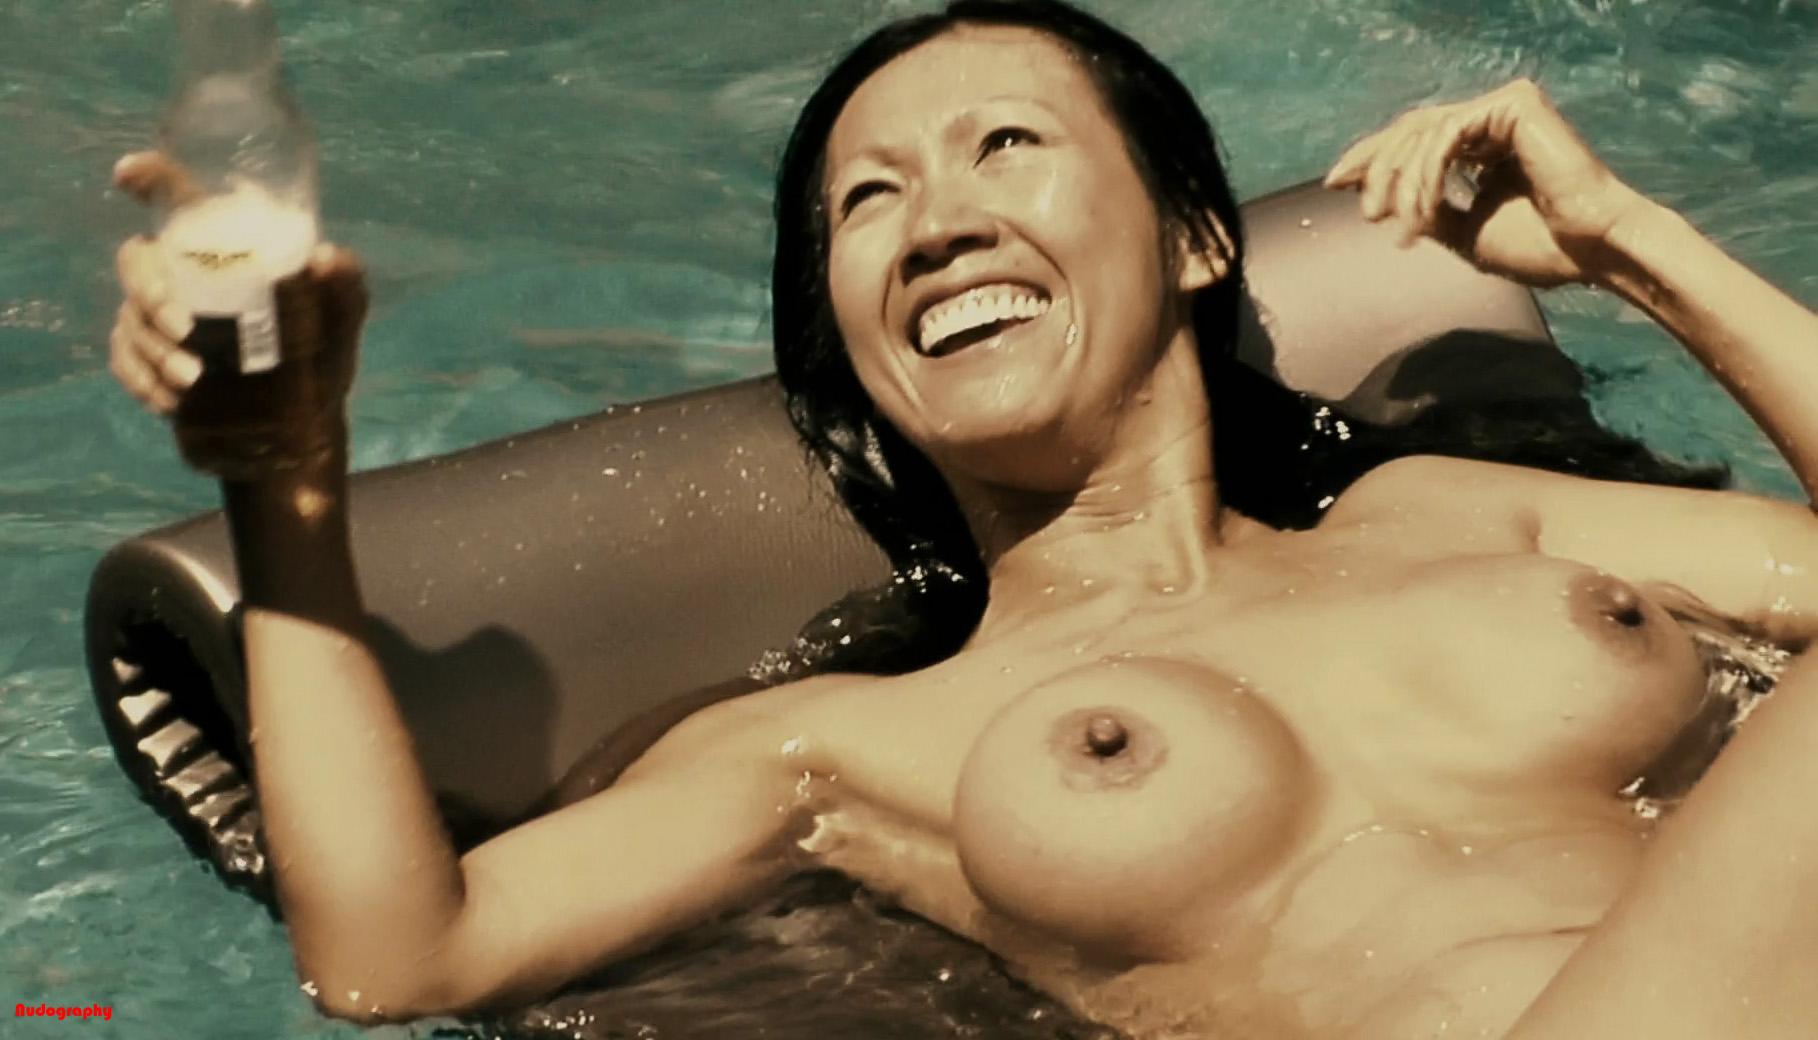 nude beach porn pics florida